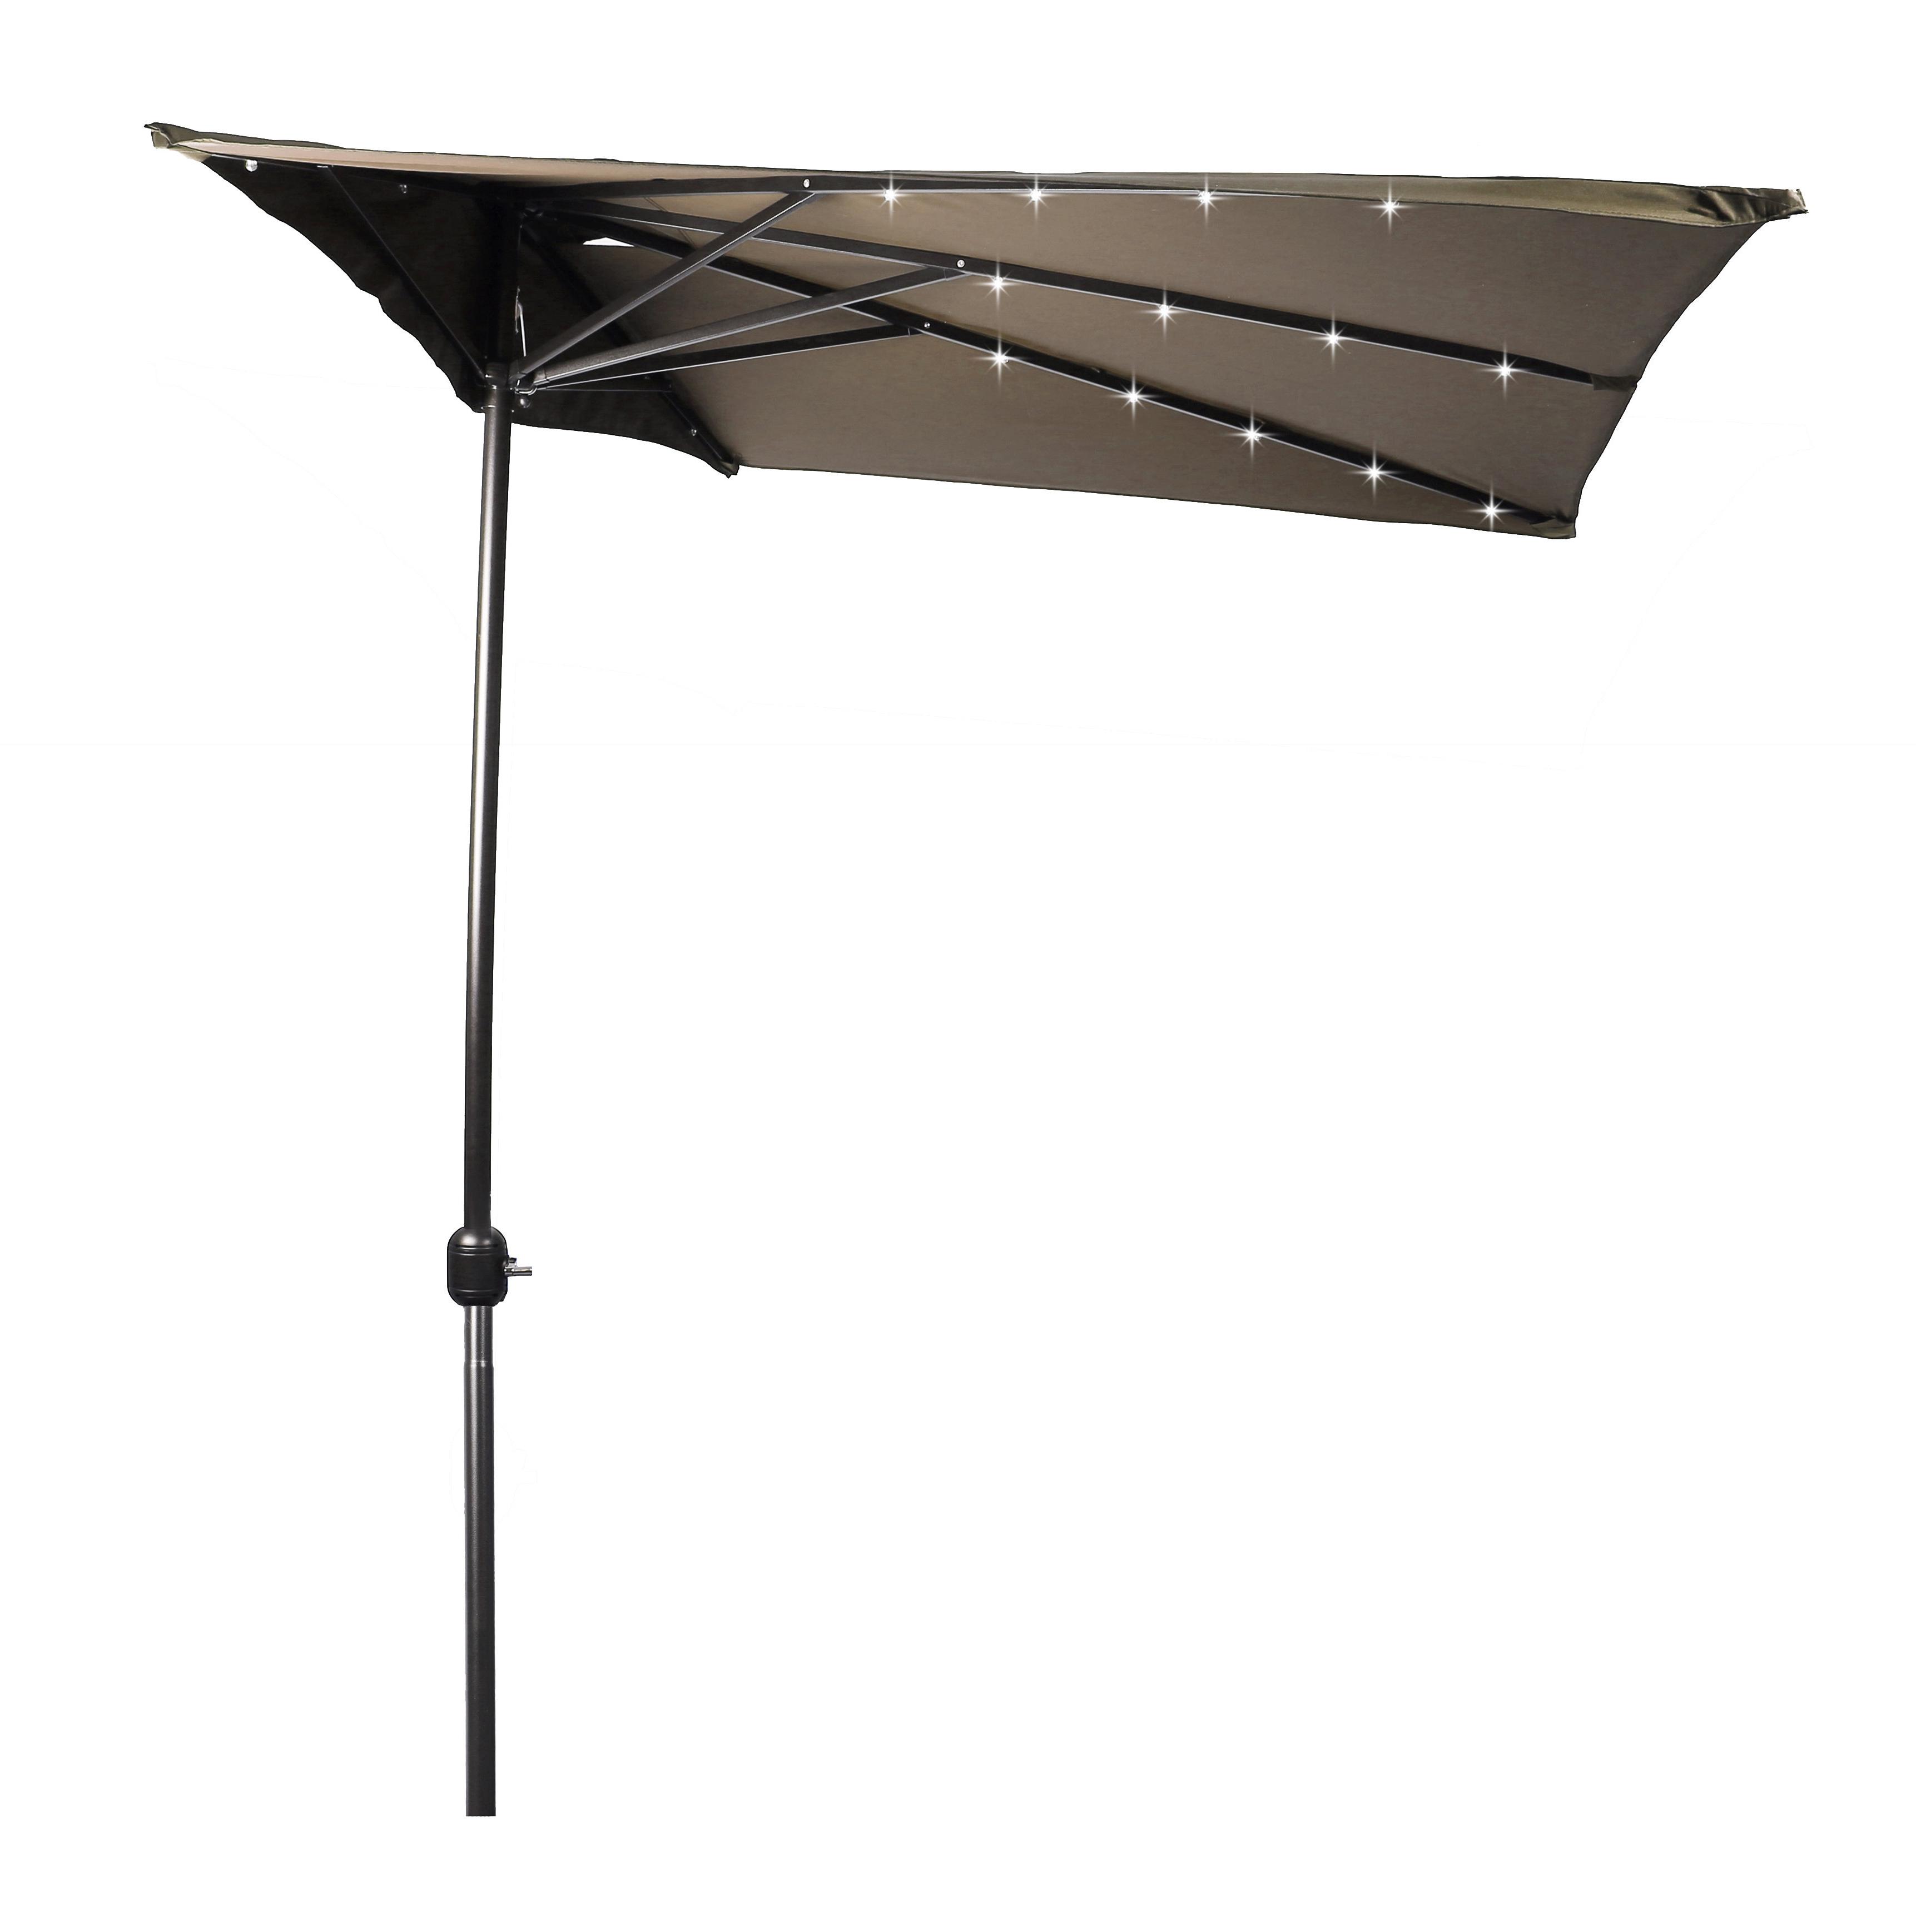 Brazelton 6.5' Lighted Half Umbrella With Regard To Trendy Monty Half Market Umbrellas (Gallery 11 of 20)